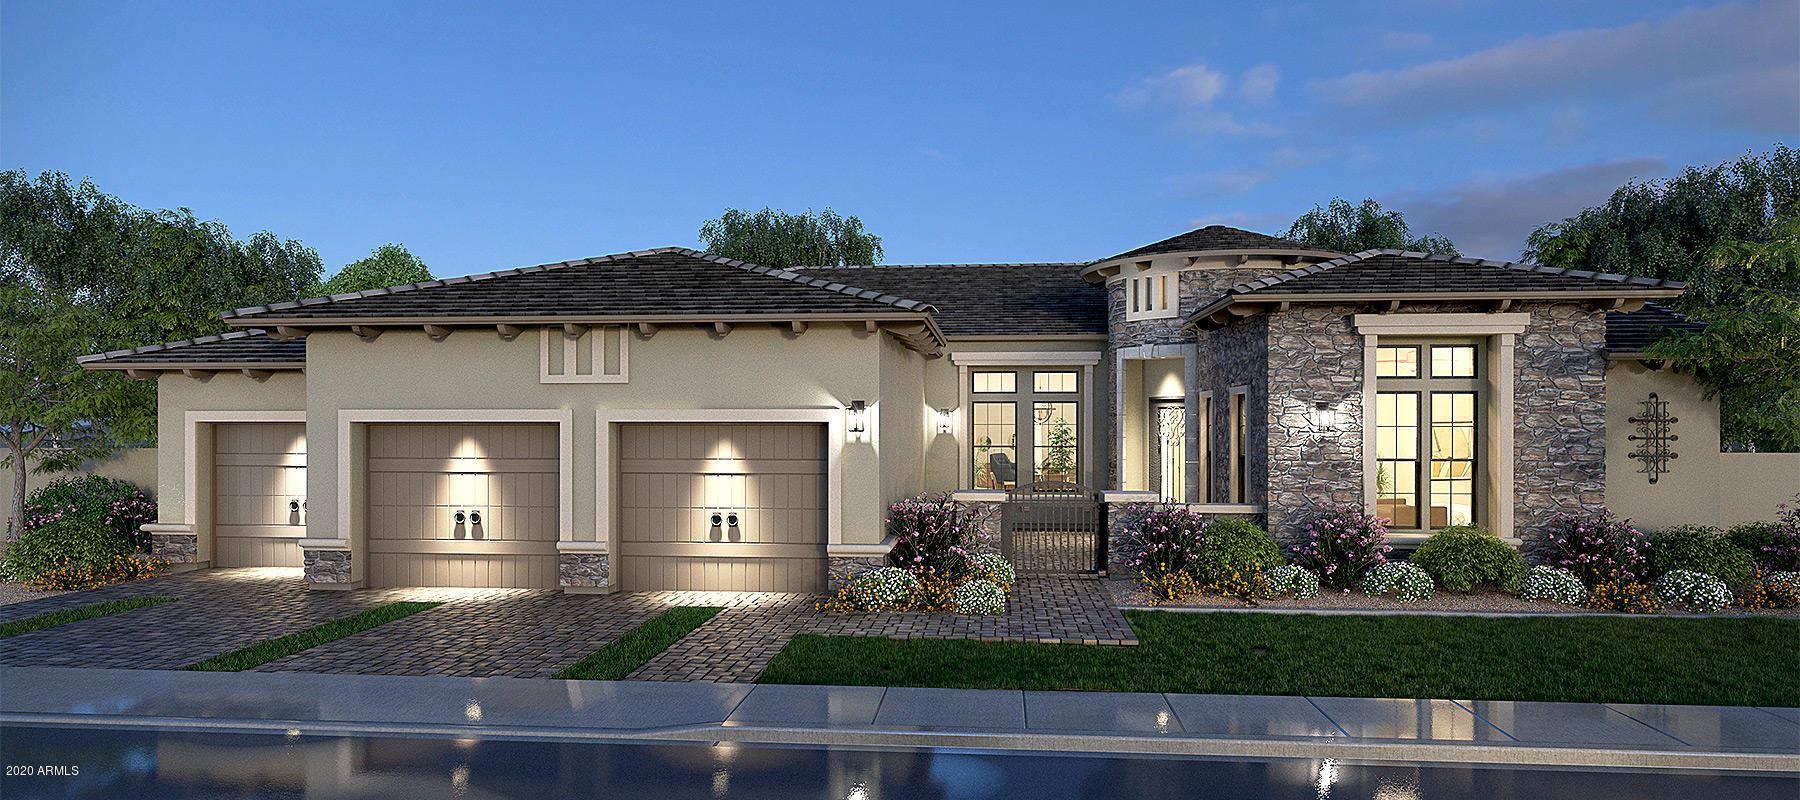 2782 E WATERMAN Street, Gilbert, AZ 85297 - MLS#: 6102988